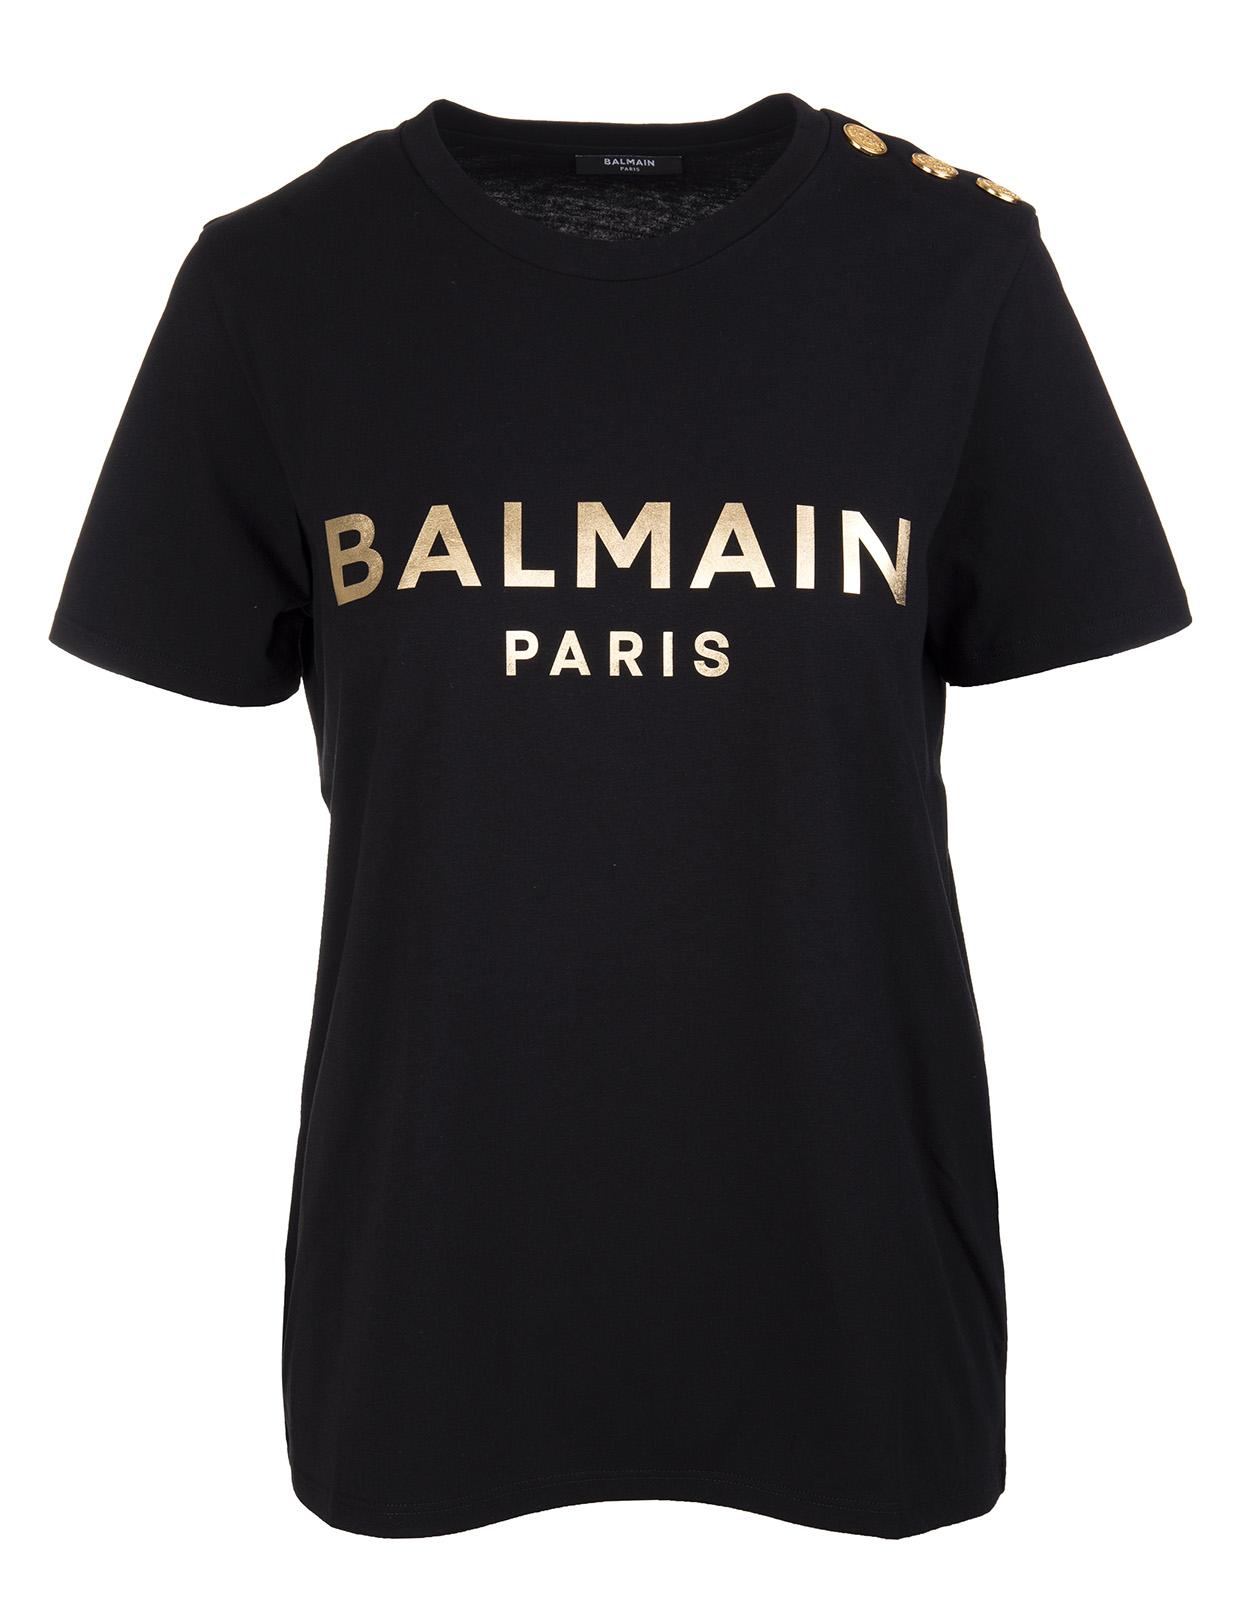 BALMAIN Woman Black and Gold Logo T-Shirt With Buttons